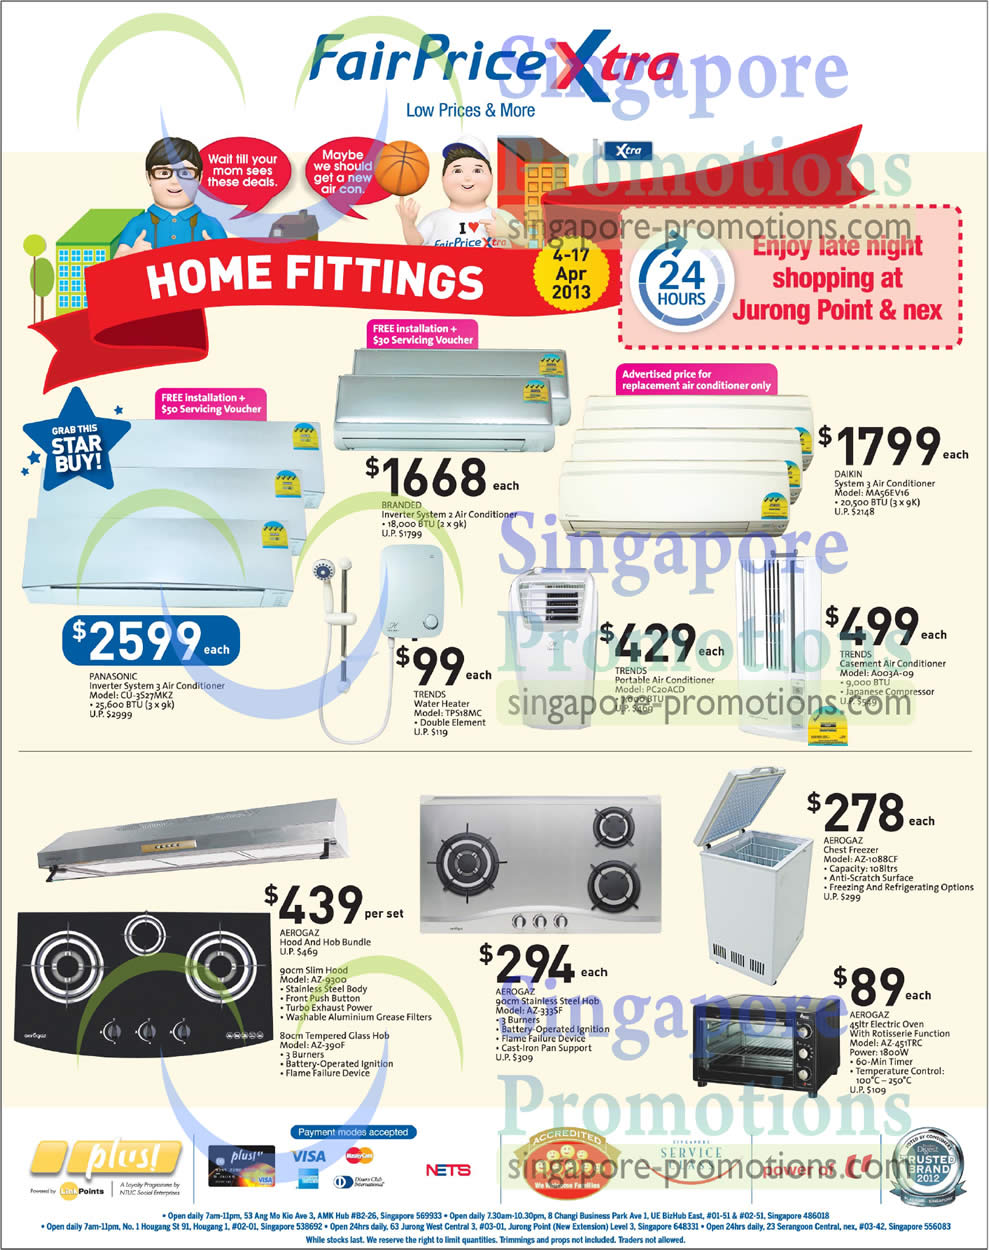 Air Conditioner, Water Heater, Hob, Freezer, Oven, Panasonic, Trends, Daikin, Aerogaz, Panasonic CU-3527MKZ Air Conditioner